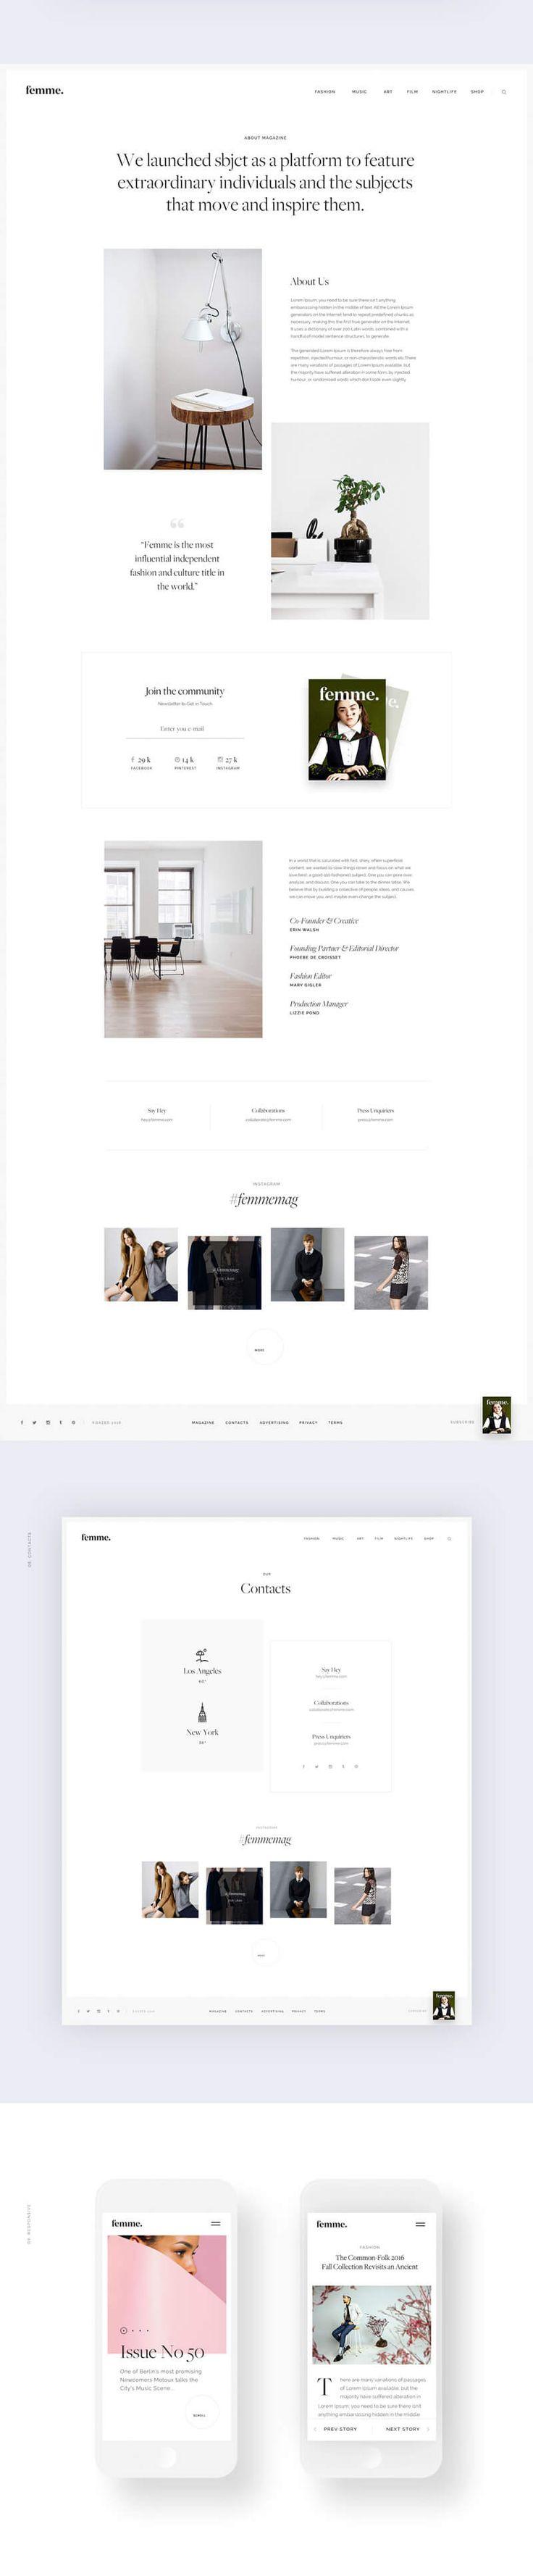 Femme5 #ui #ux#userexperience #website #webdesign #design